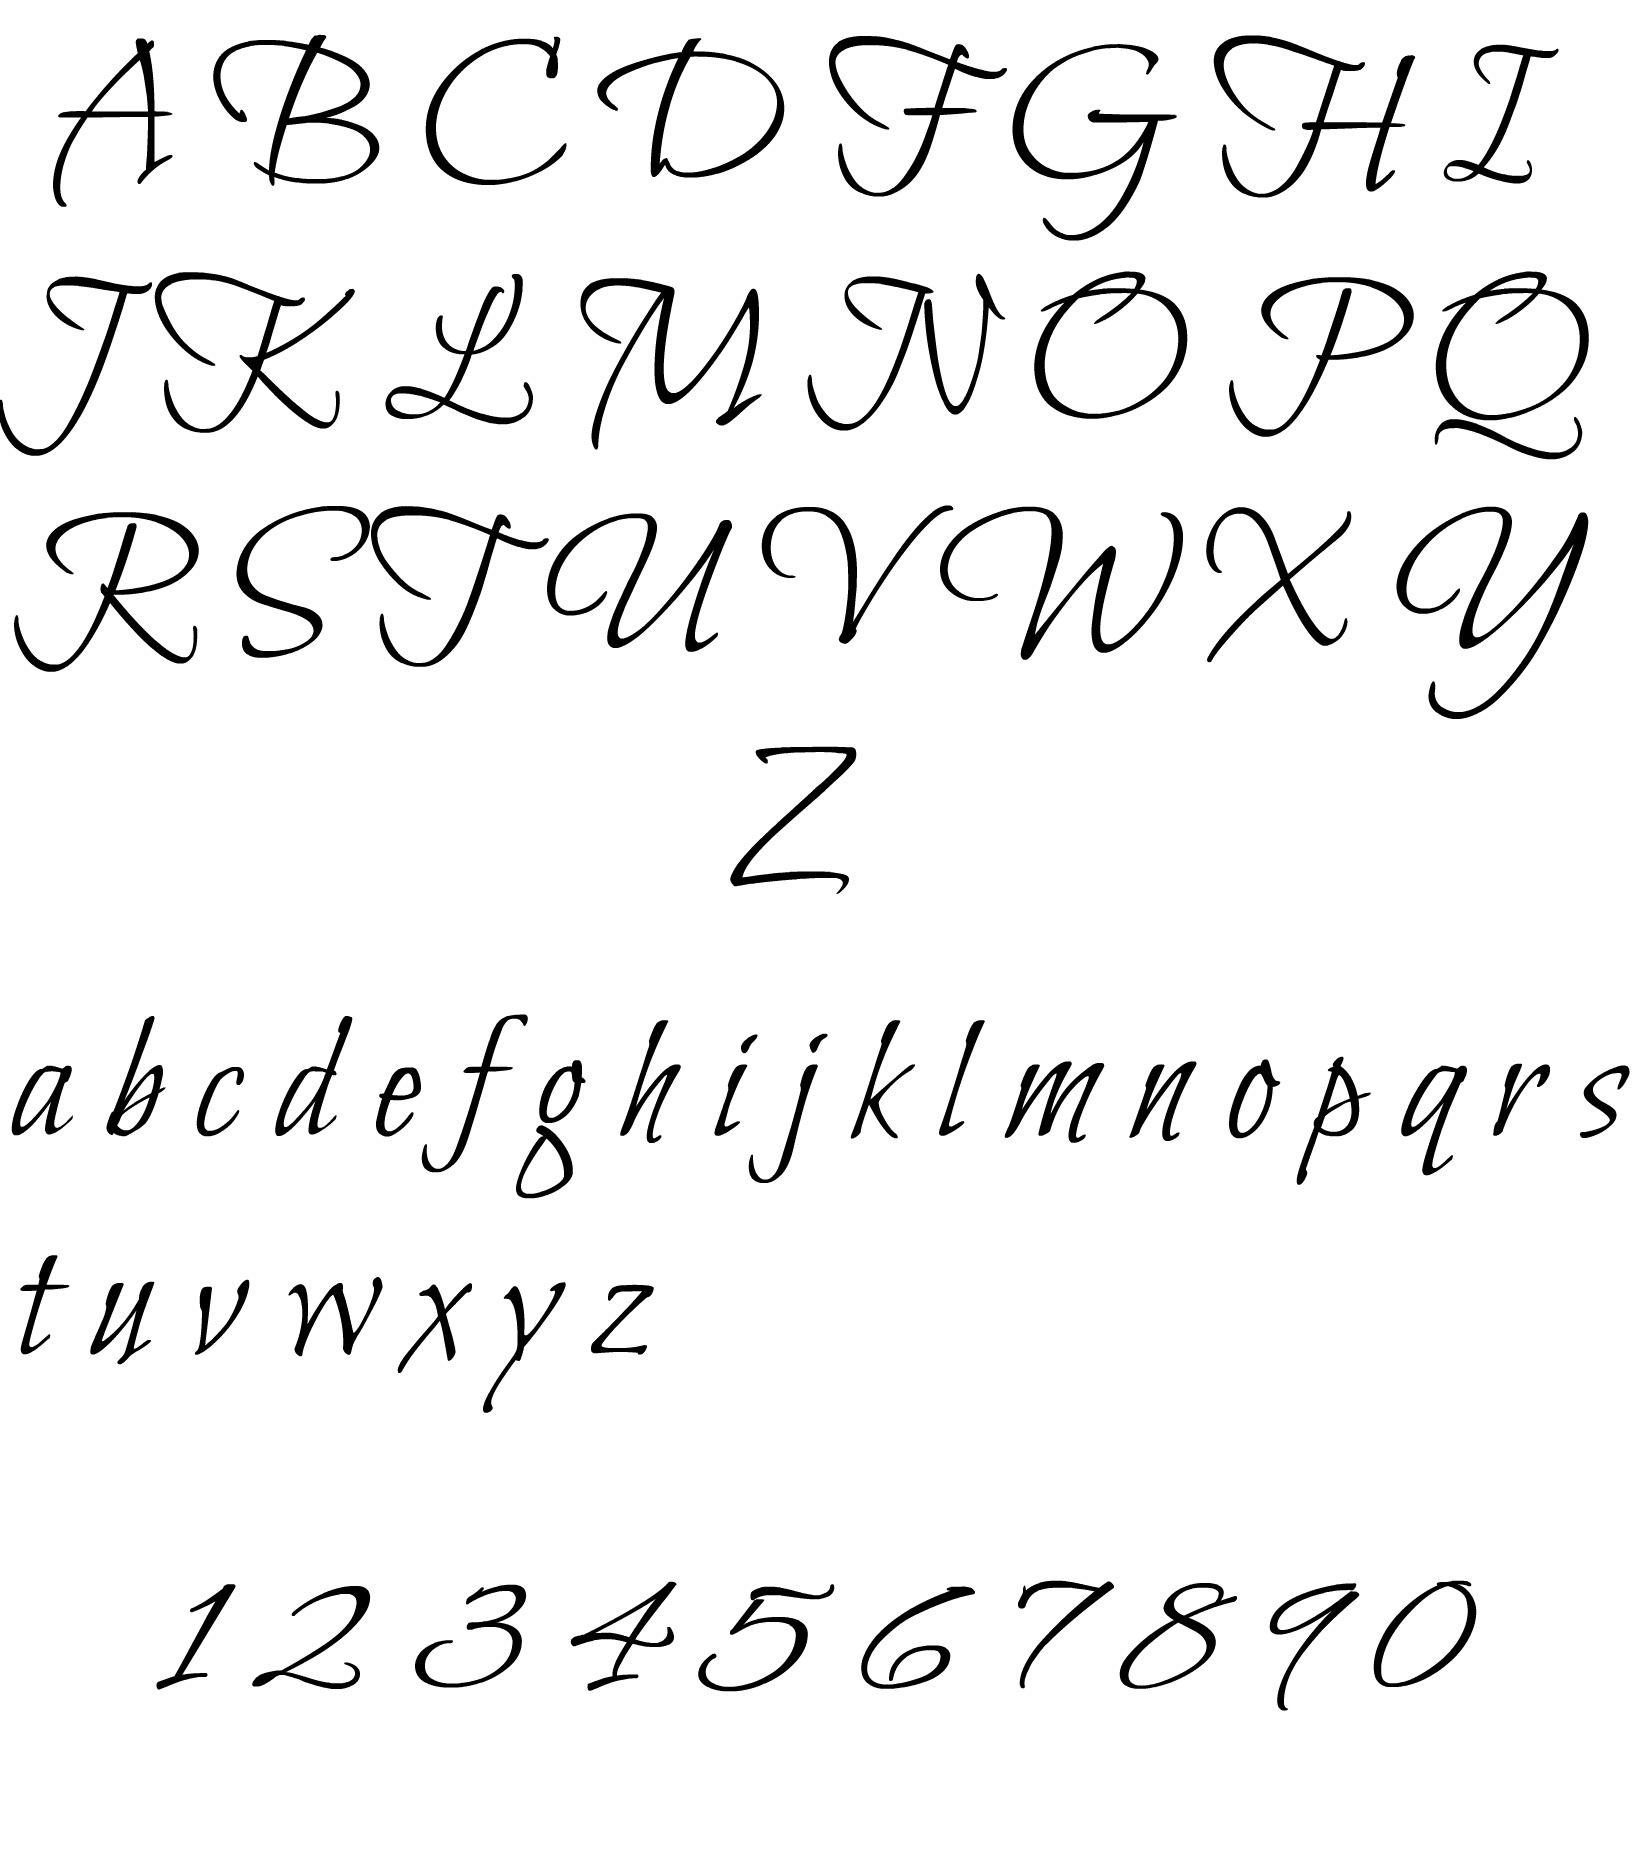 Alfabeto Per Tatuaggi Caratteri Alfabetici Alfabeto Lettere